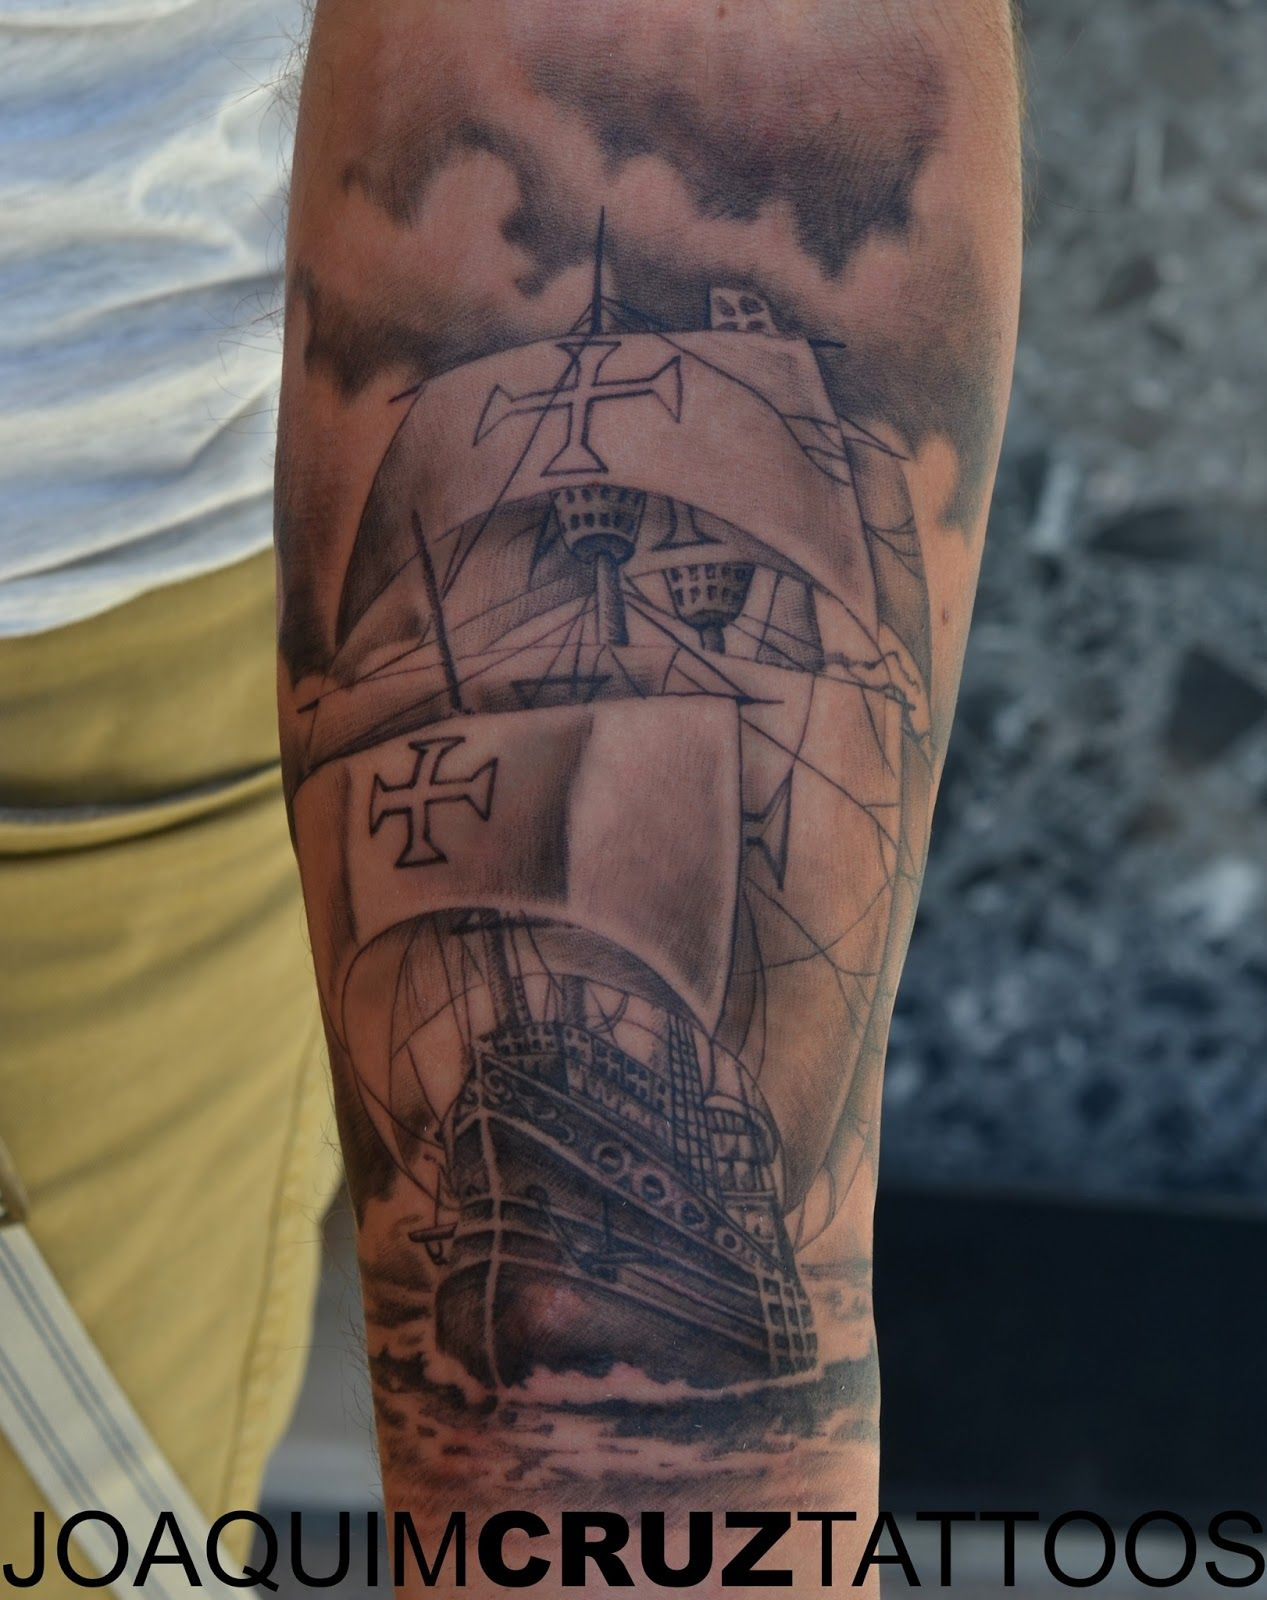 Pin by Monica Silva on tattoos | Tattoos, Portuguese ...